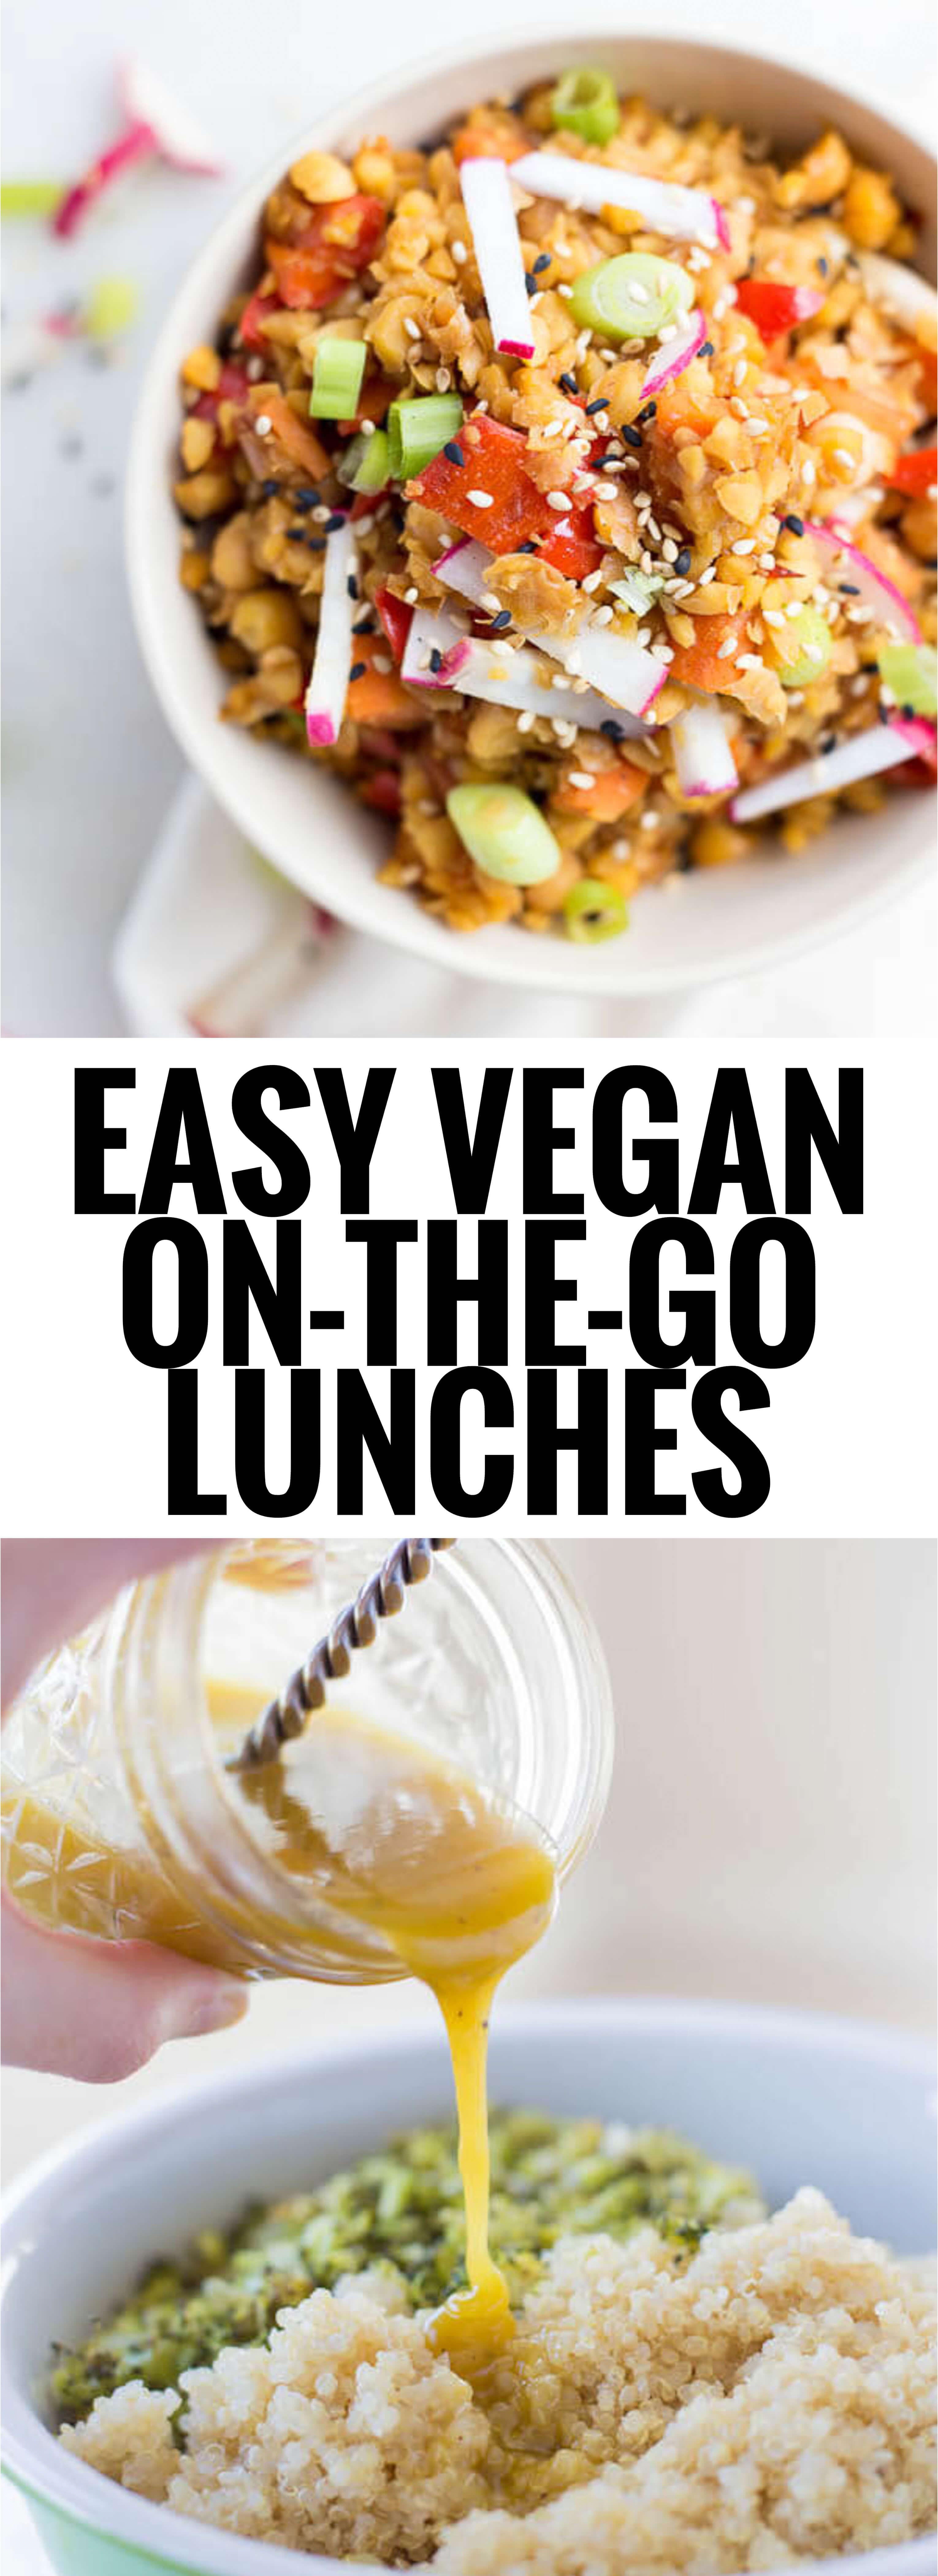 Vegan Recipes Healthy  Easy Vegan the Go Lunches Fooduzzi